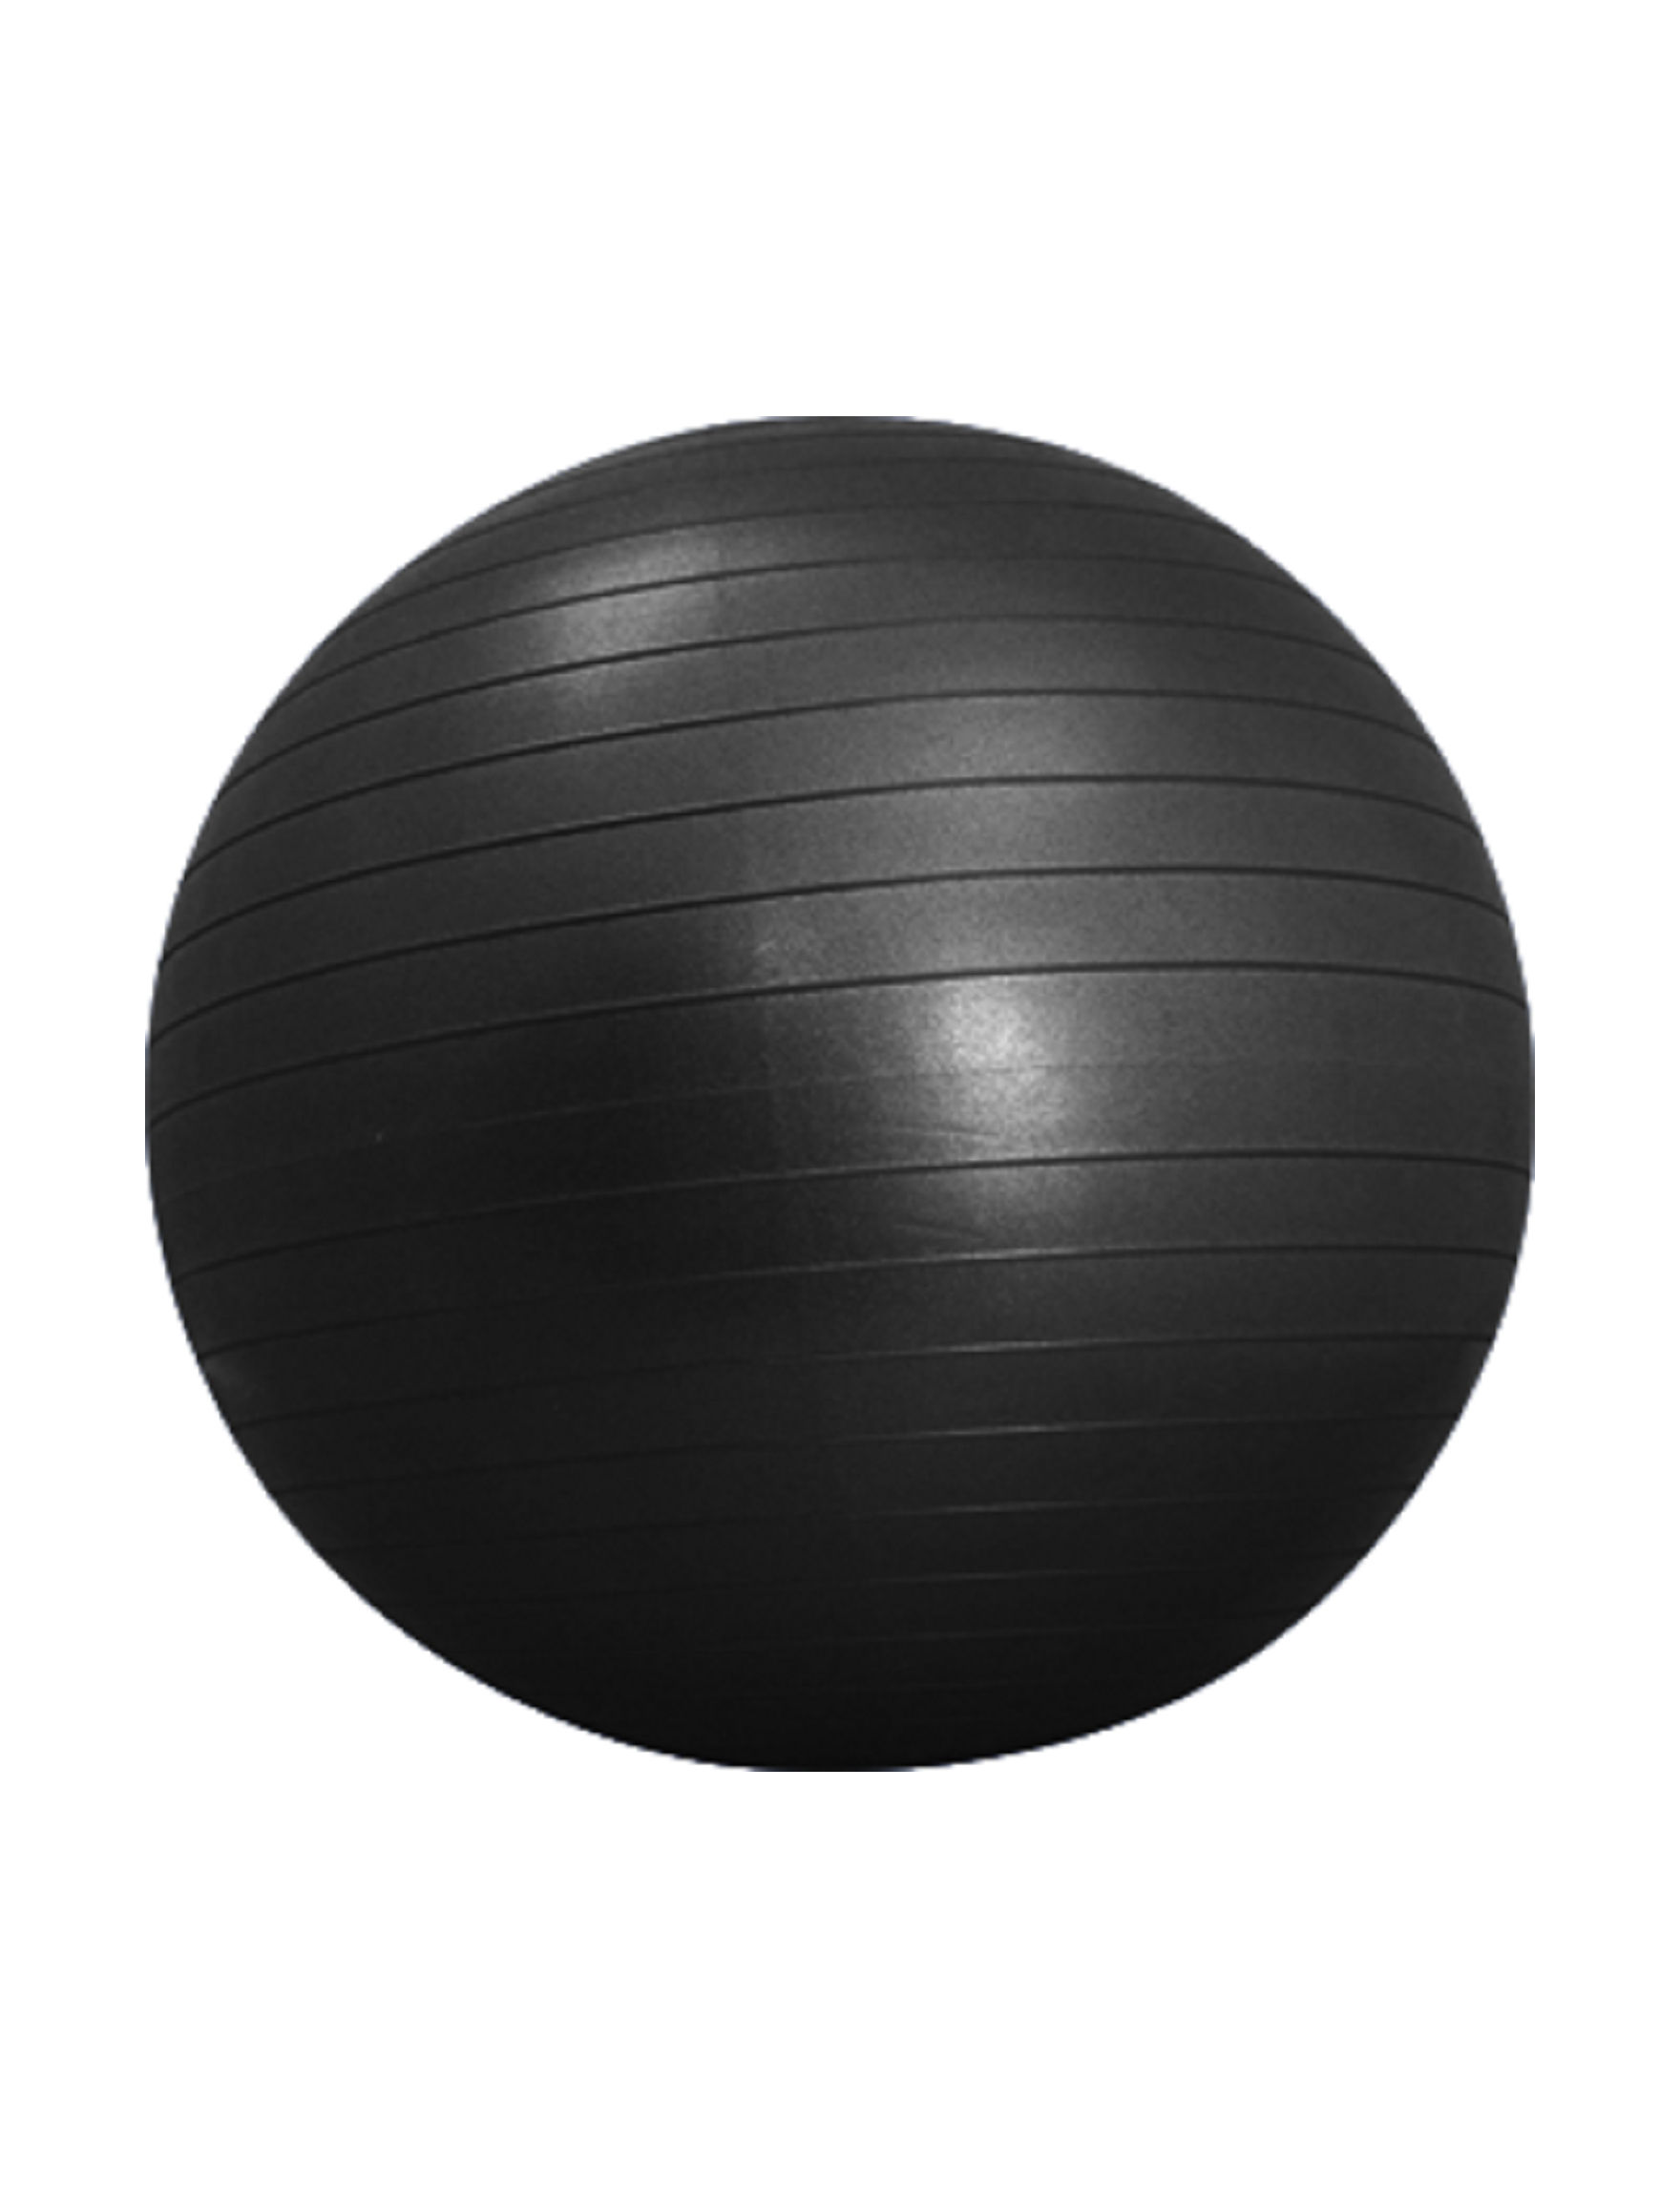 Gourmet Home Black Fitness Equipment